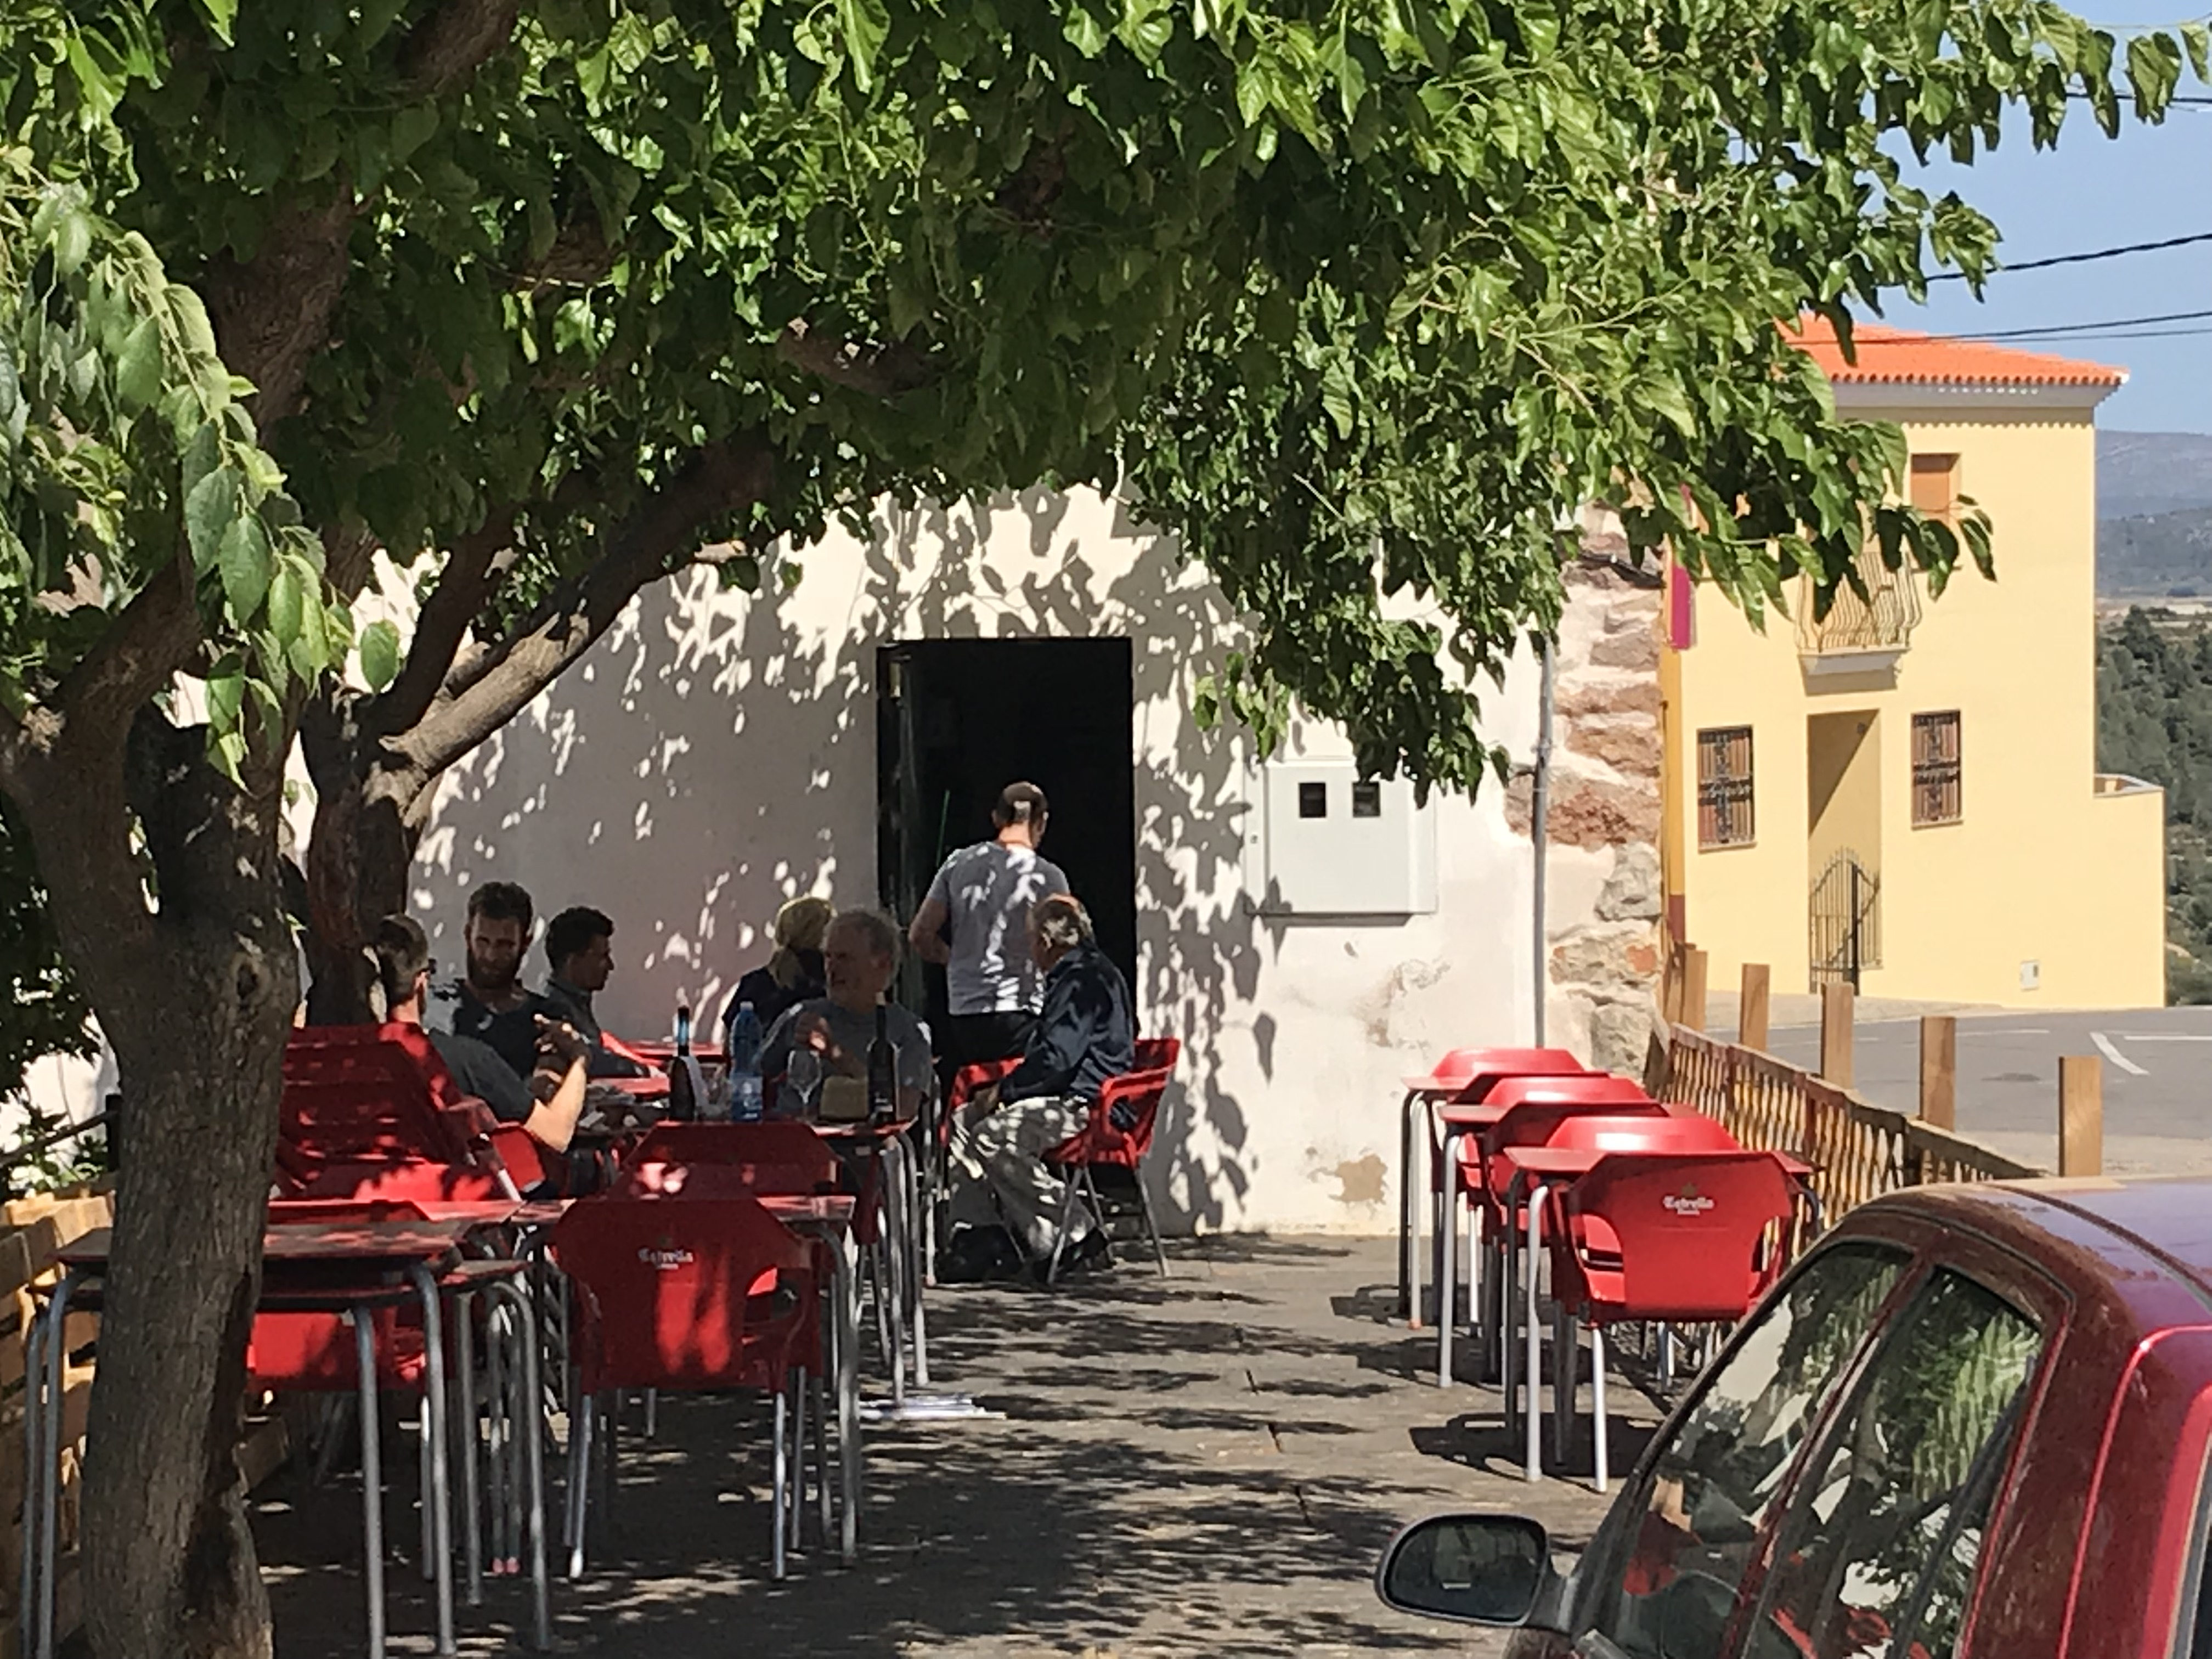 'Restaurant Cal mistero (Les Useres)